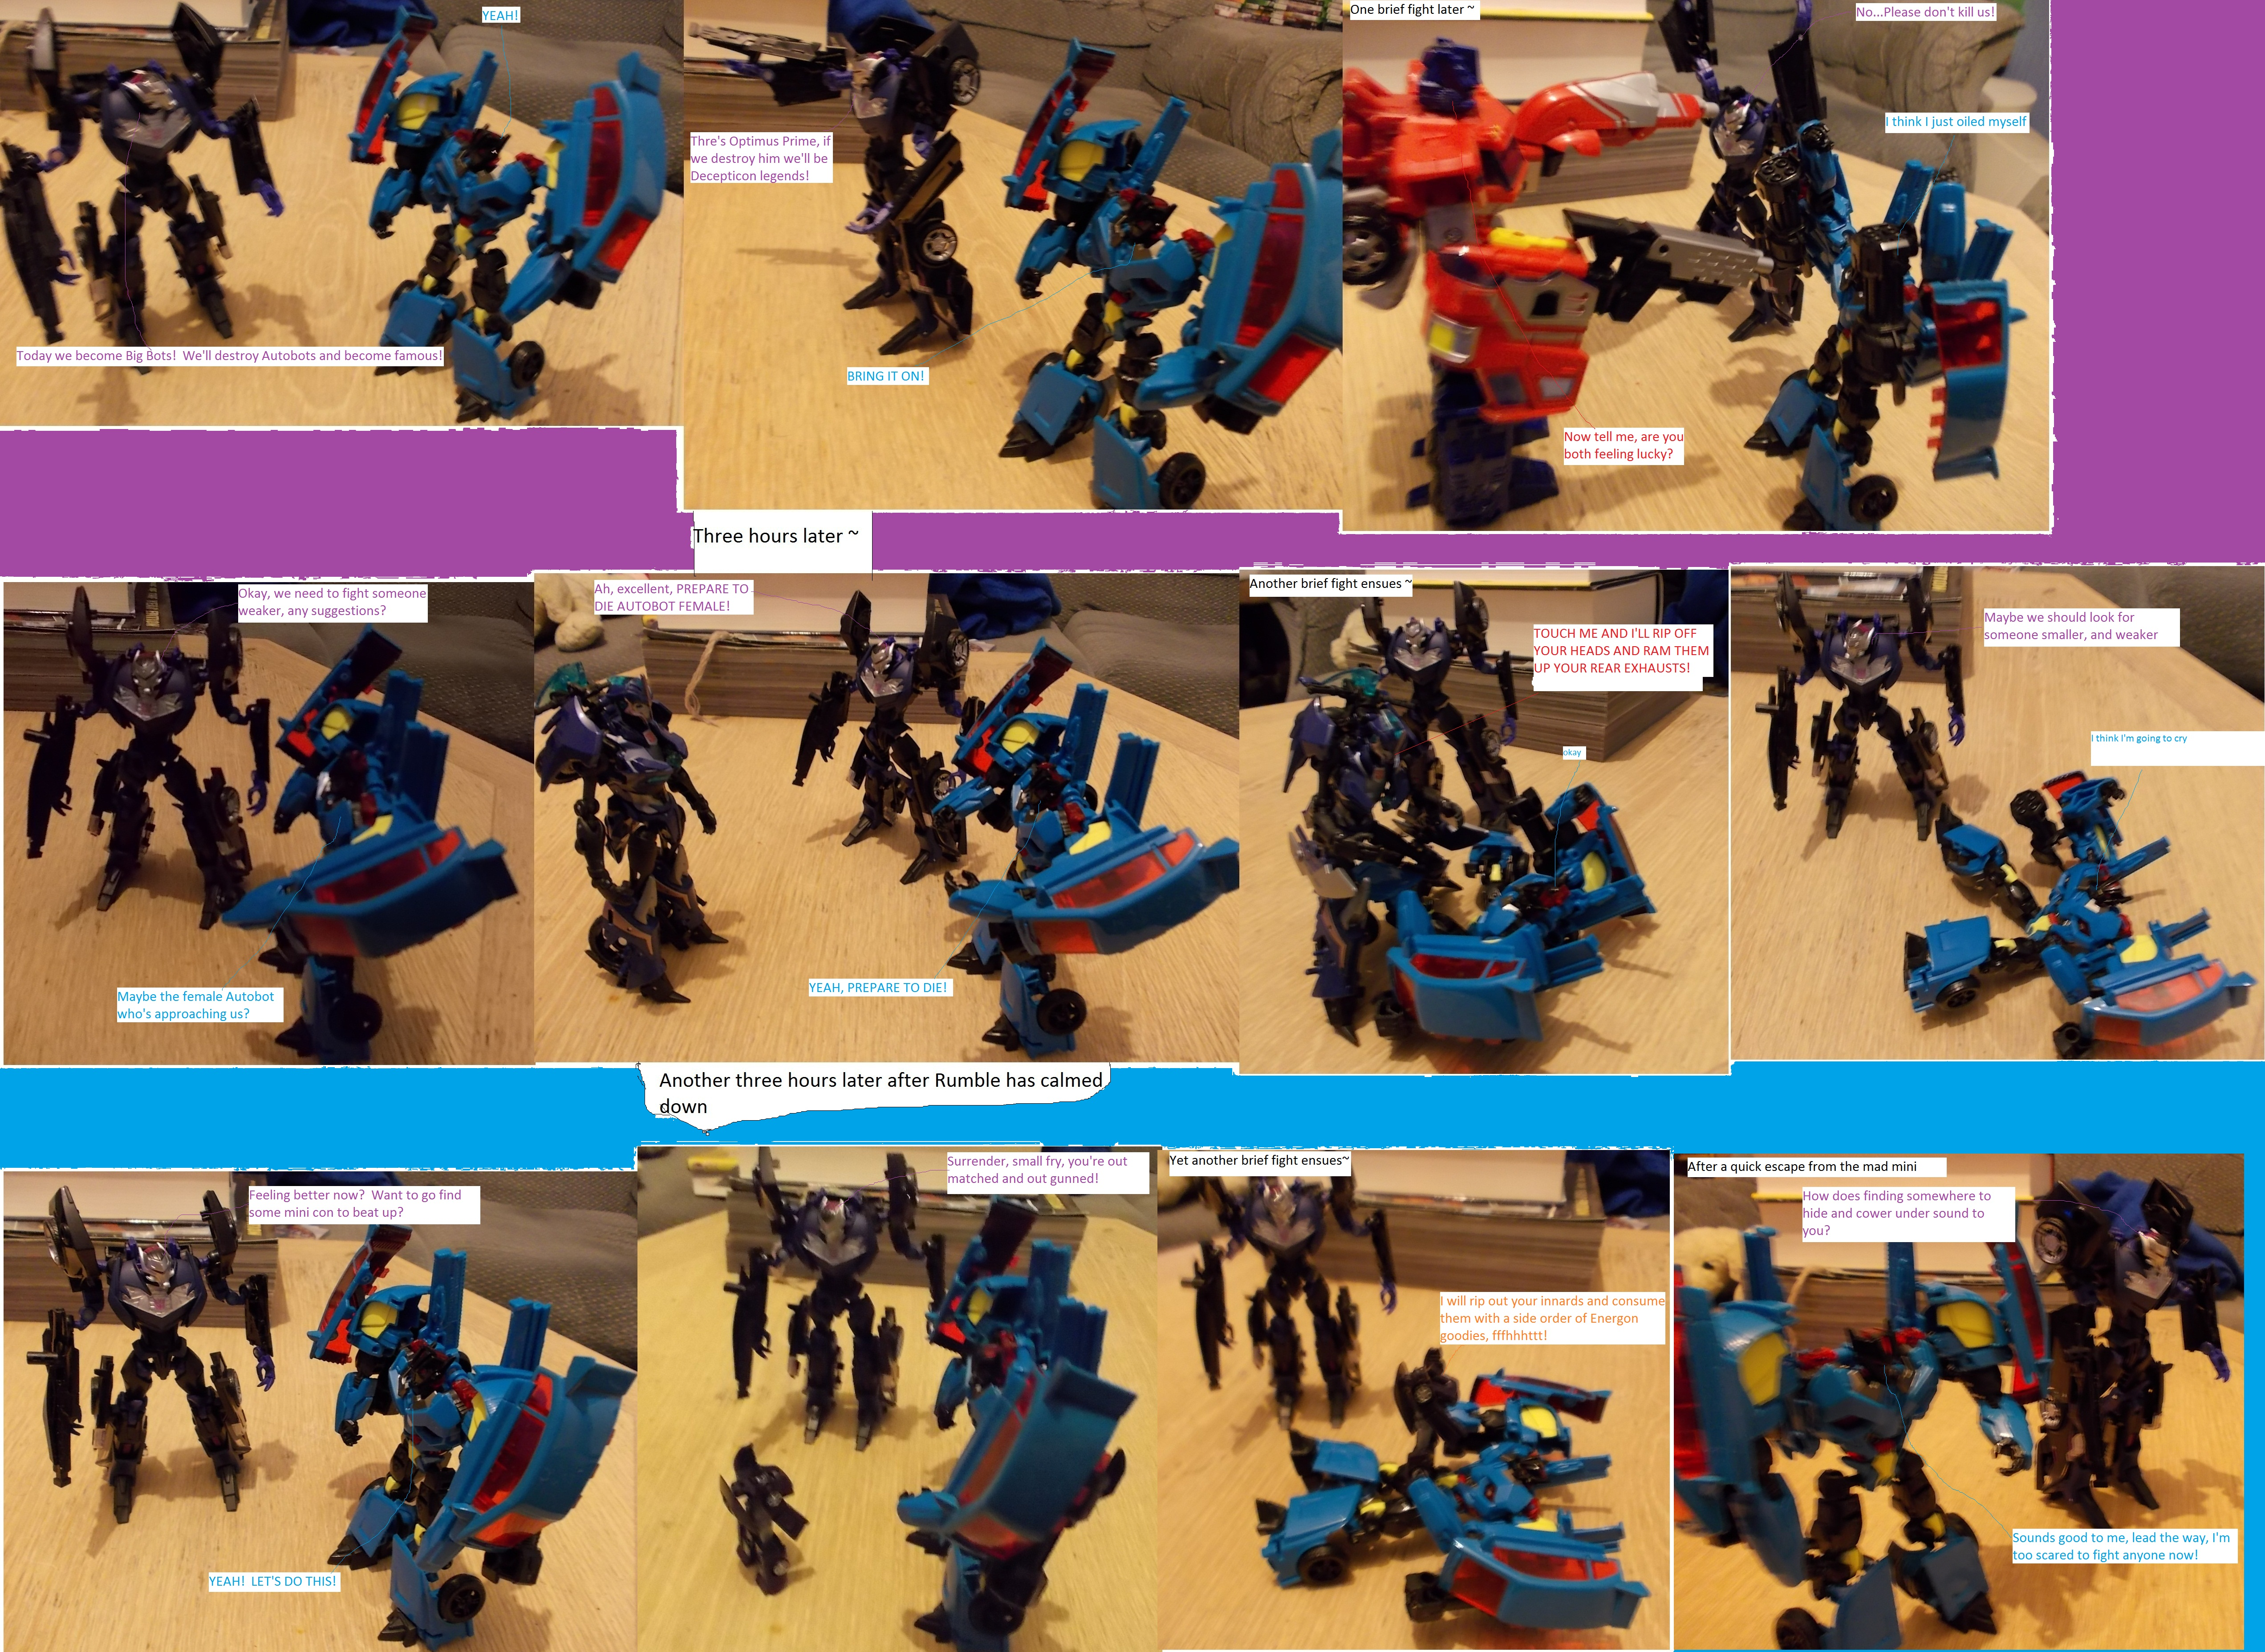 to_be_the_big_bots_by_reinahw-d5v6z3k.jpg